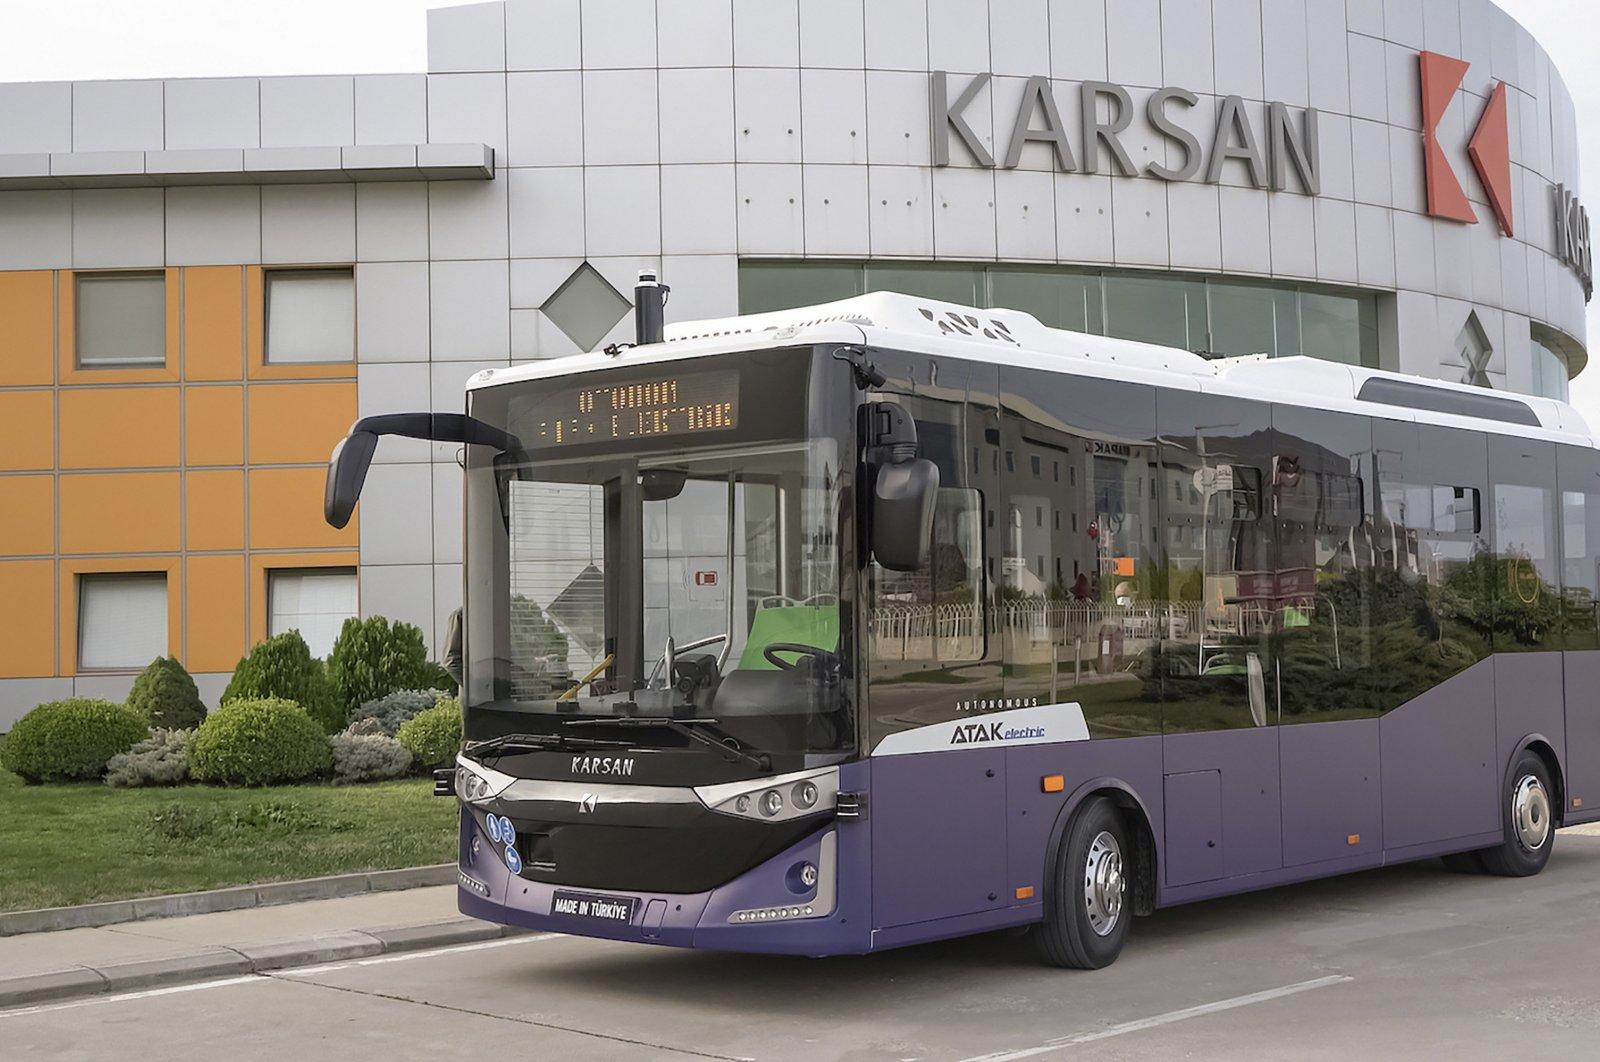 A Karsan electric bus seen in front of company facility in Bursa, northwestern Turkey, June 8, 2021. (Courtesy of Karsan)